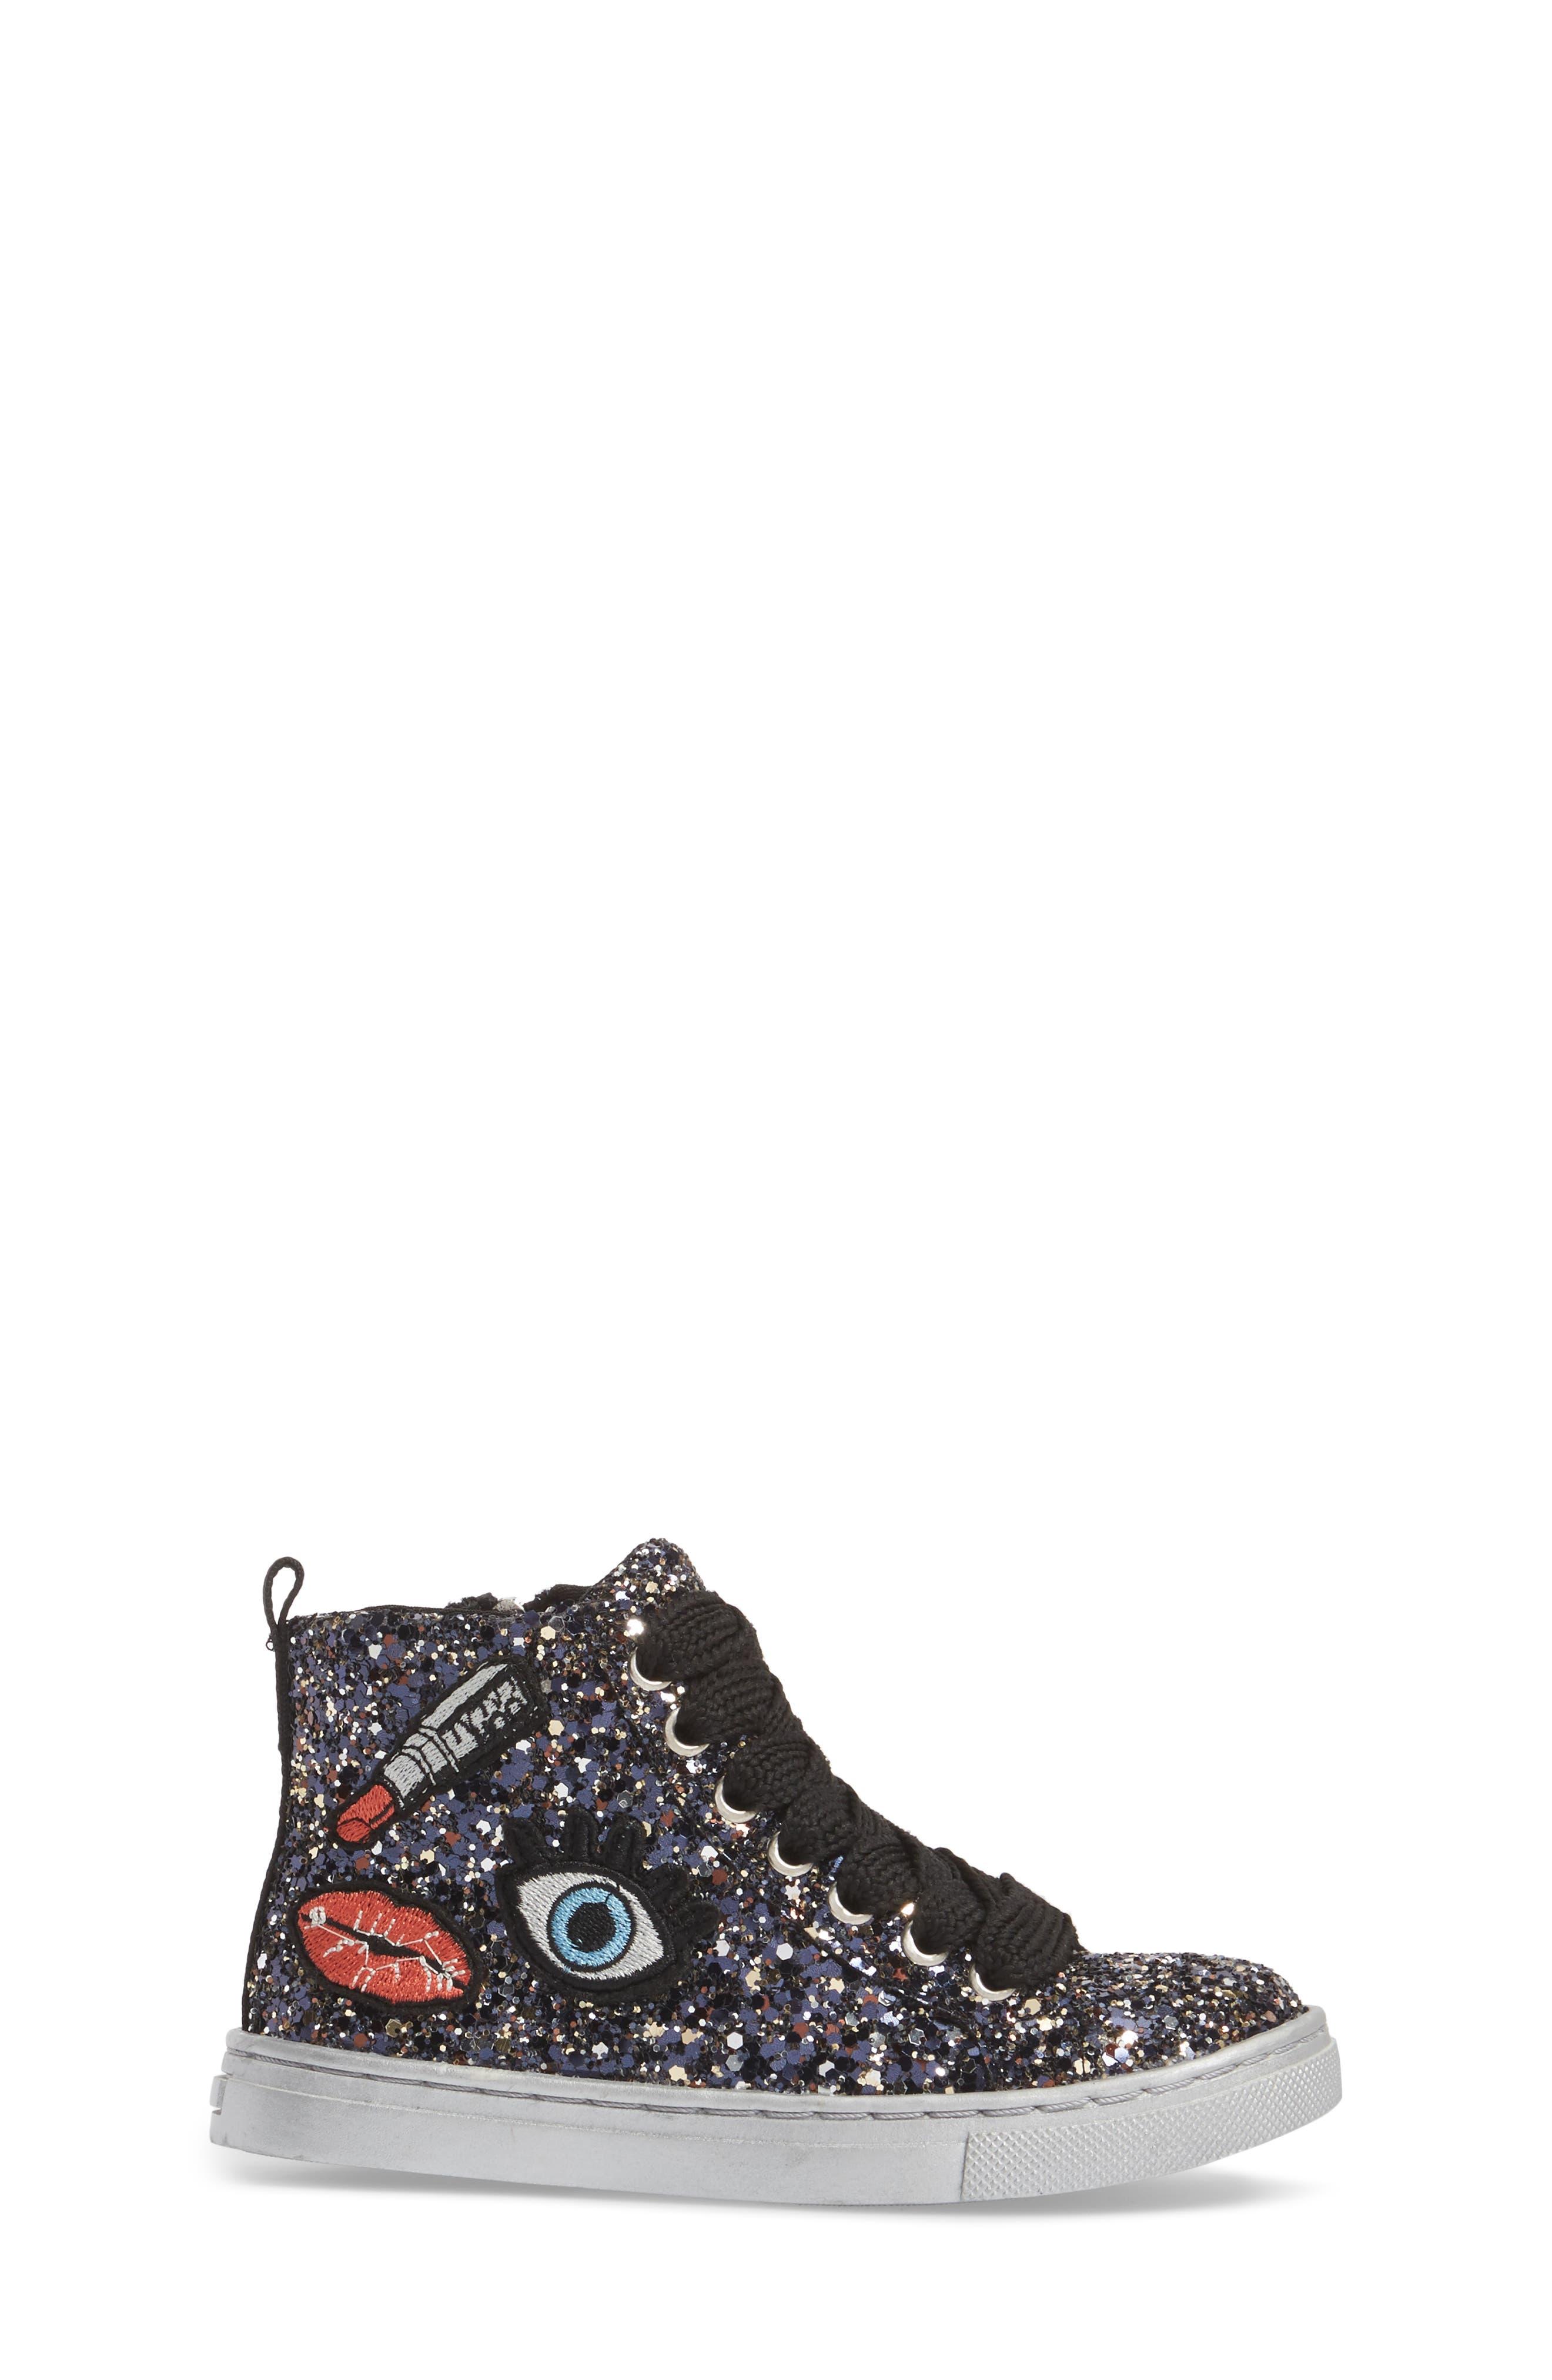 Zaine Glittery High Top Sneaker,                             Alternate thumbnail 3, color,                             Black Multi Glitter